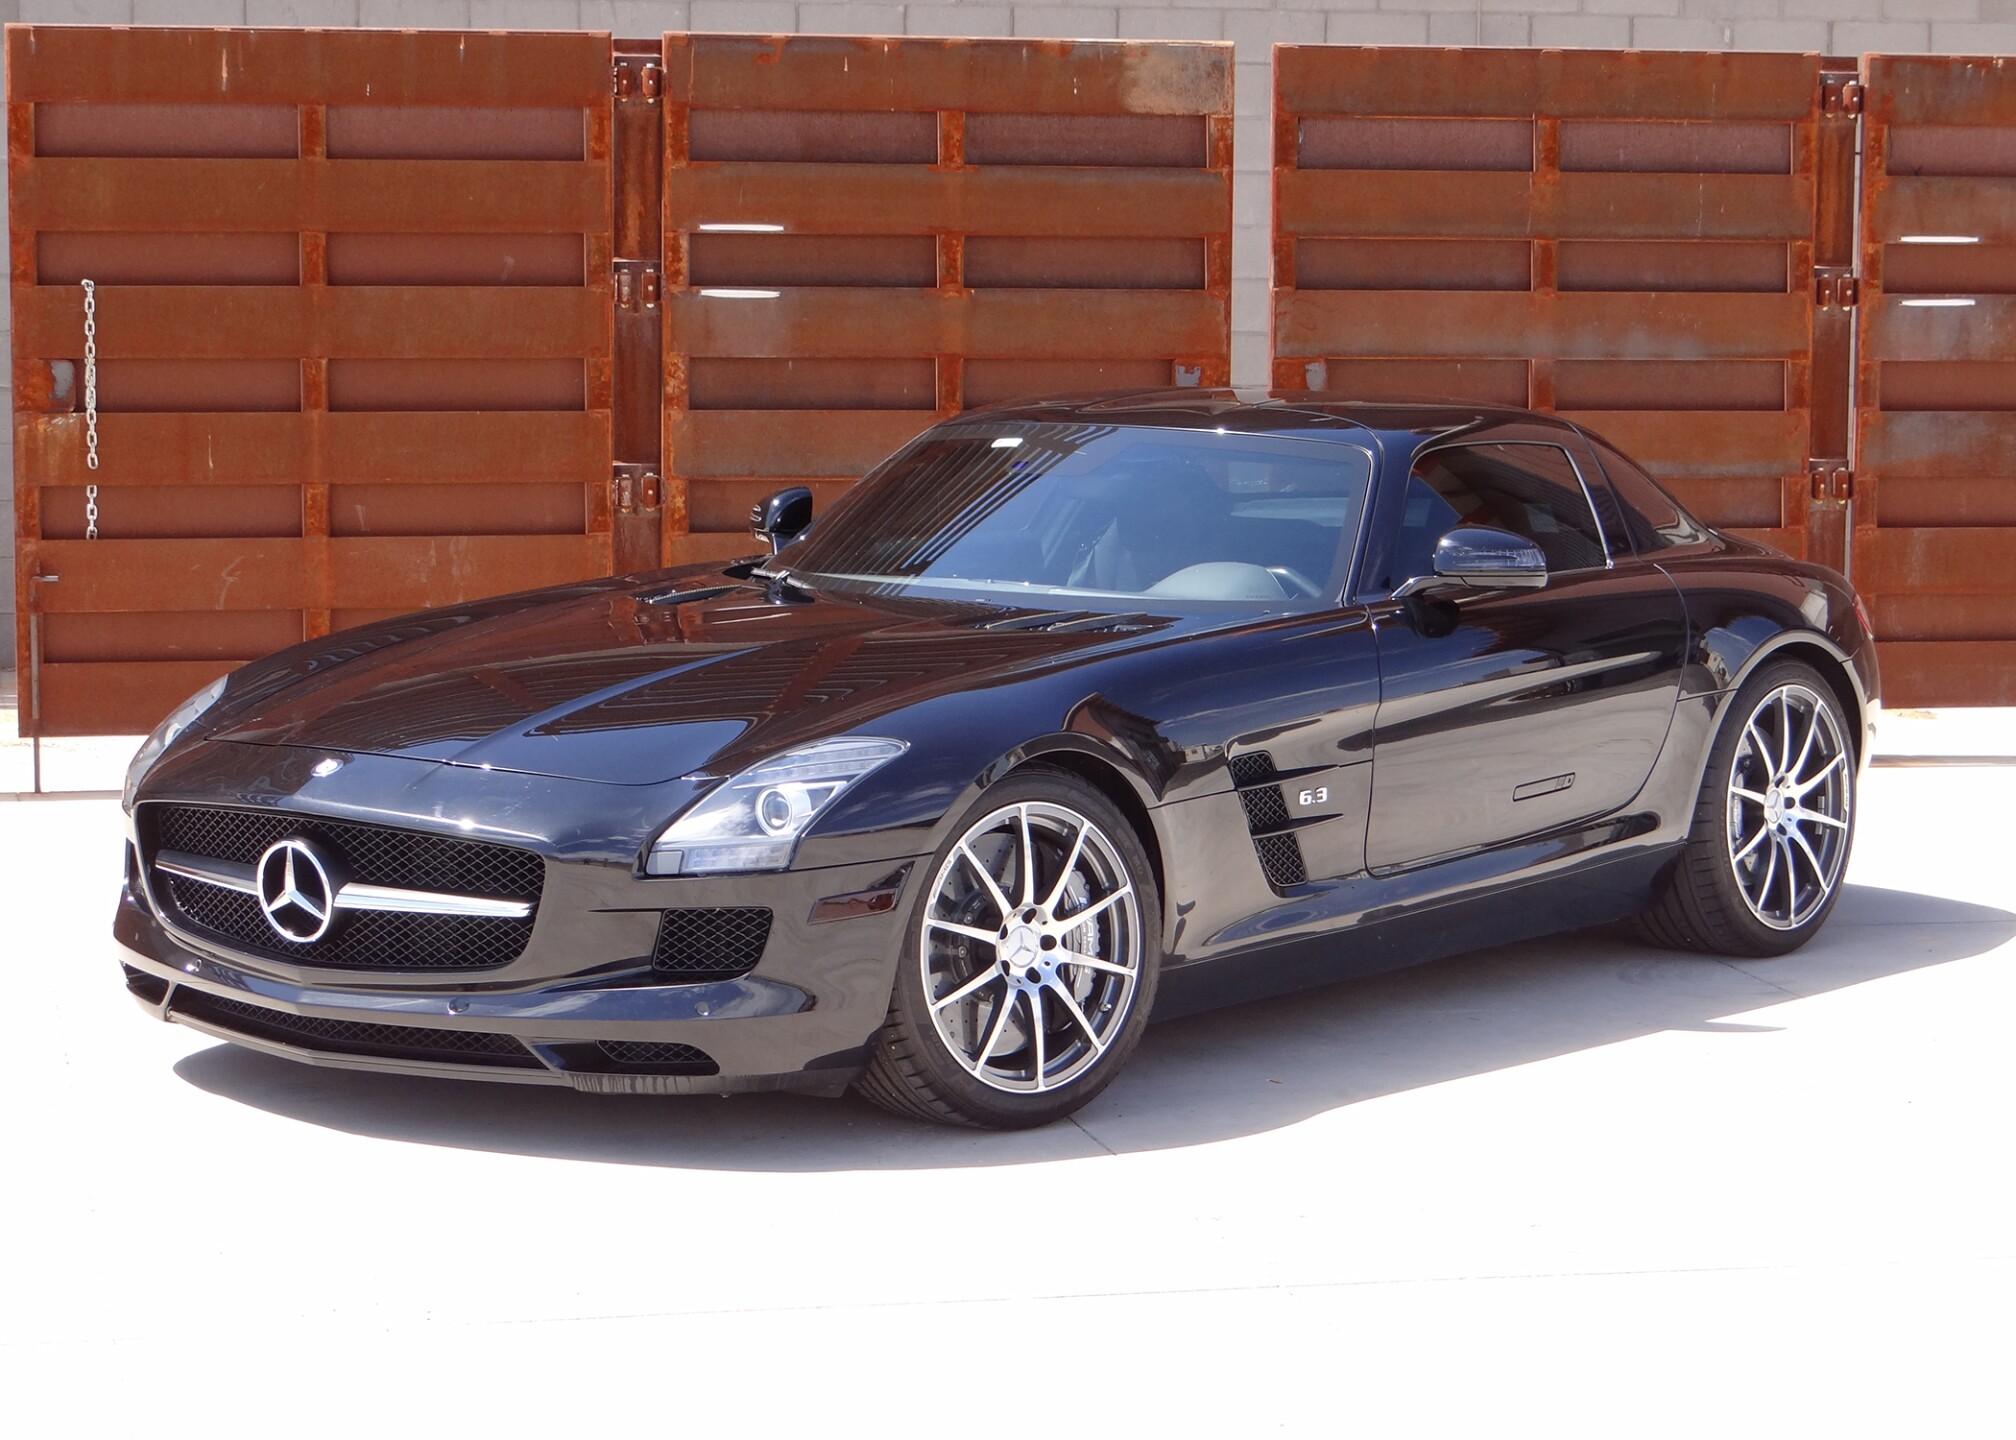 2012 Mercedes-Benz SLS AMG.jpg